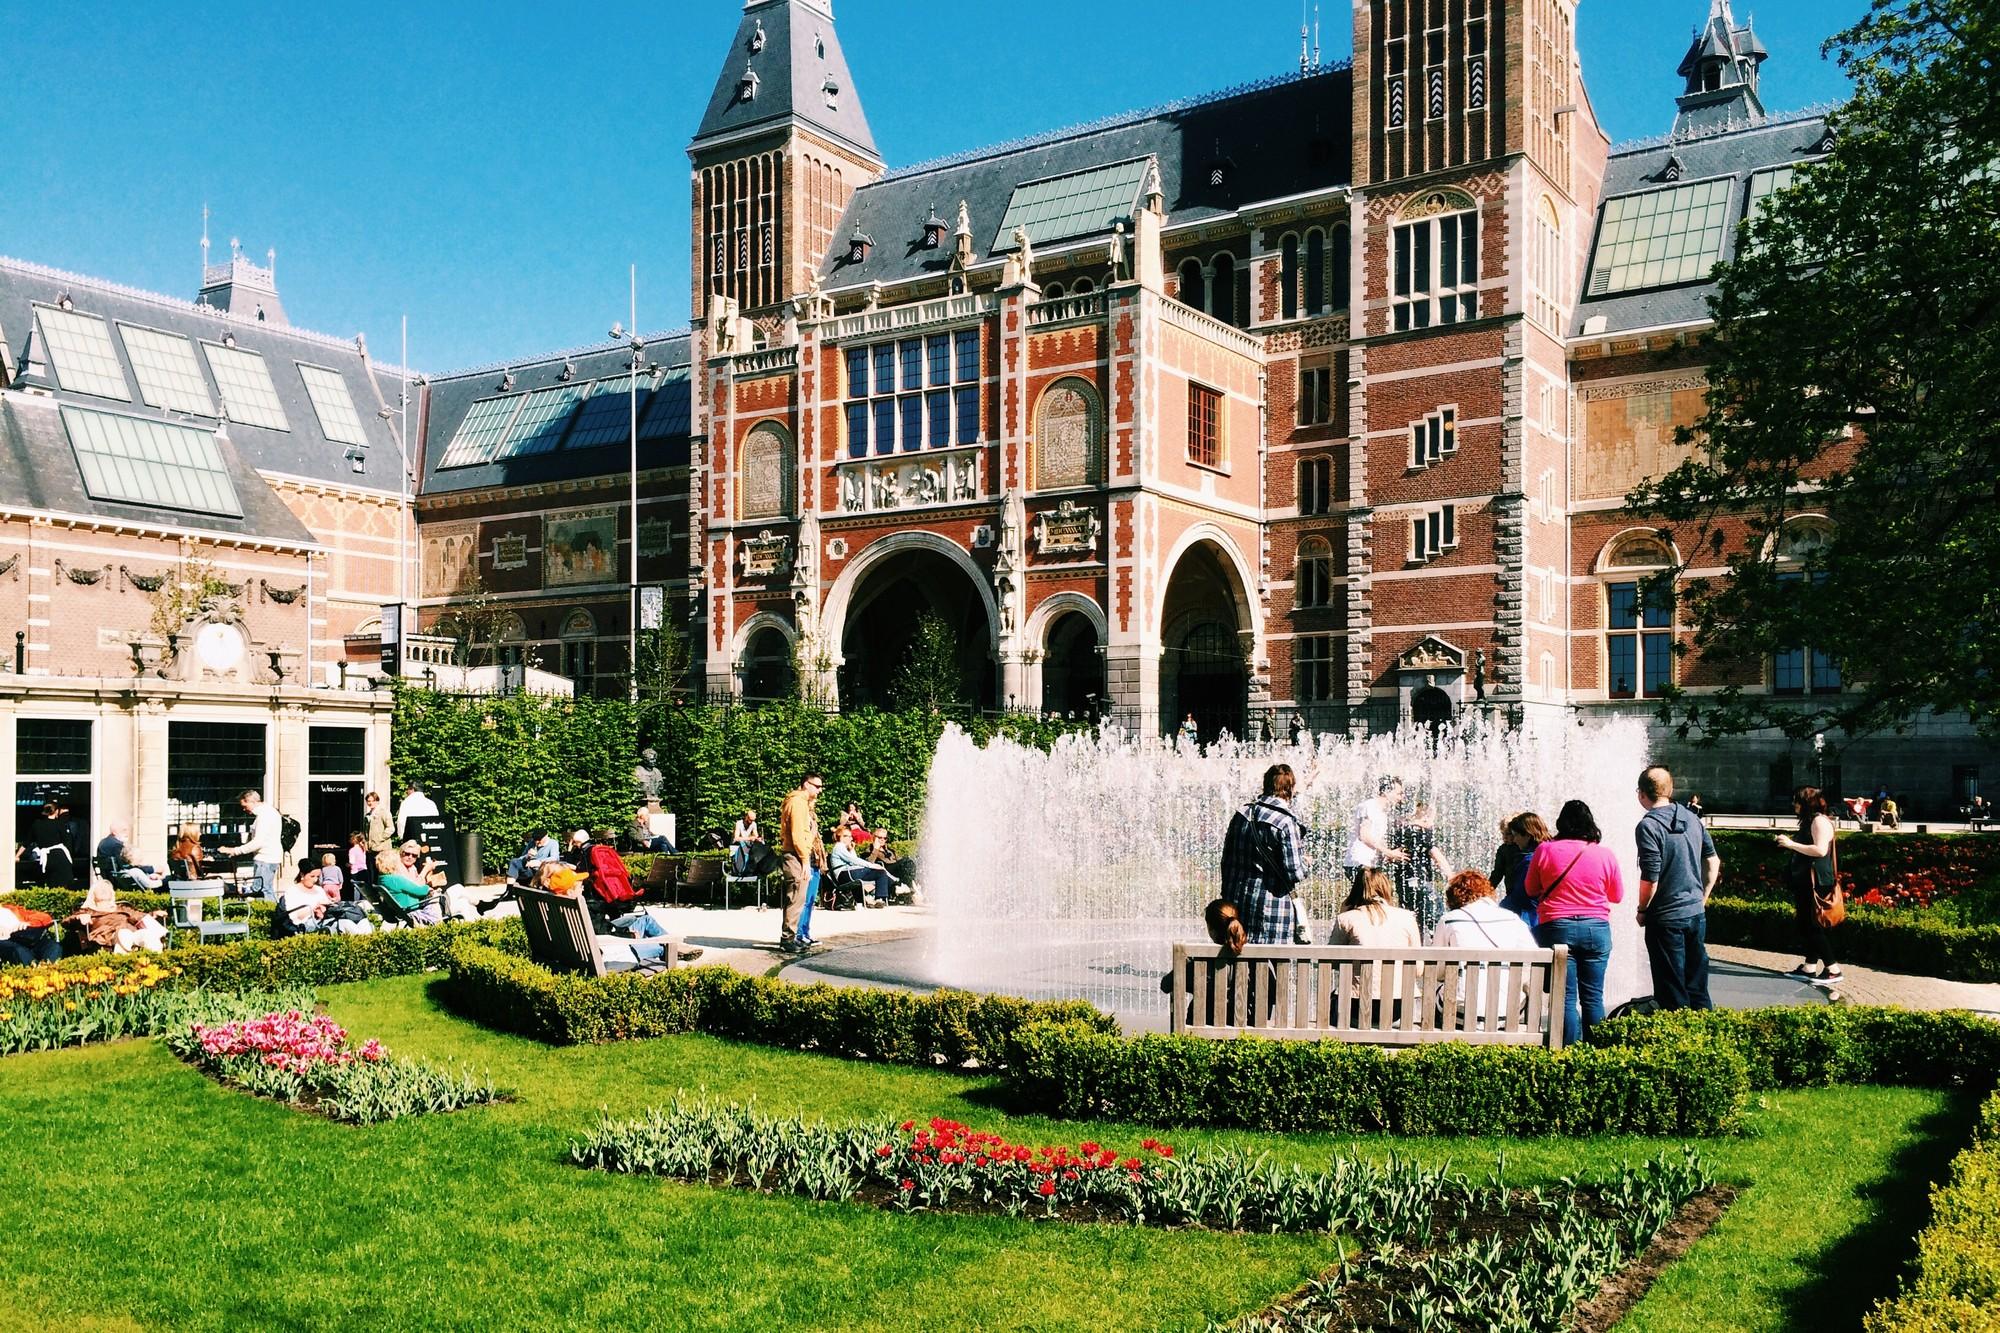 Rijksmuseum from South Gardens designed by Copijn Landschapsarchitecten, April 2014. Image © James Taylor-Foster